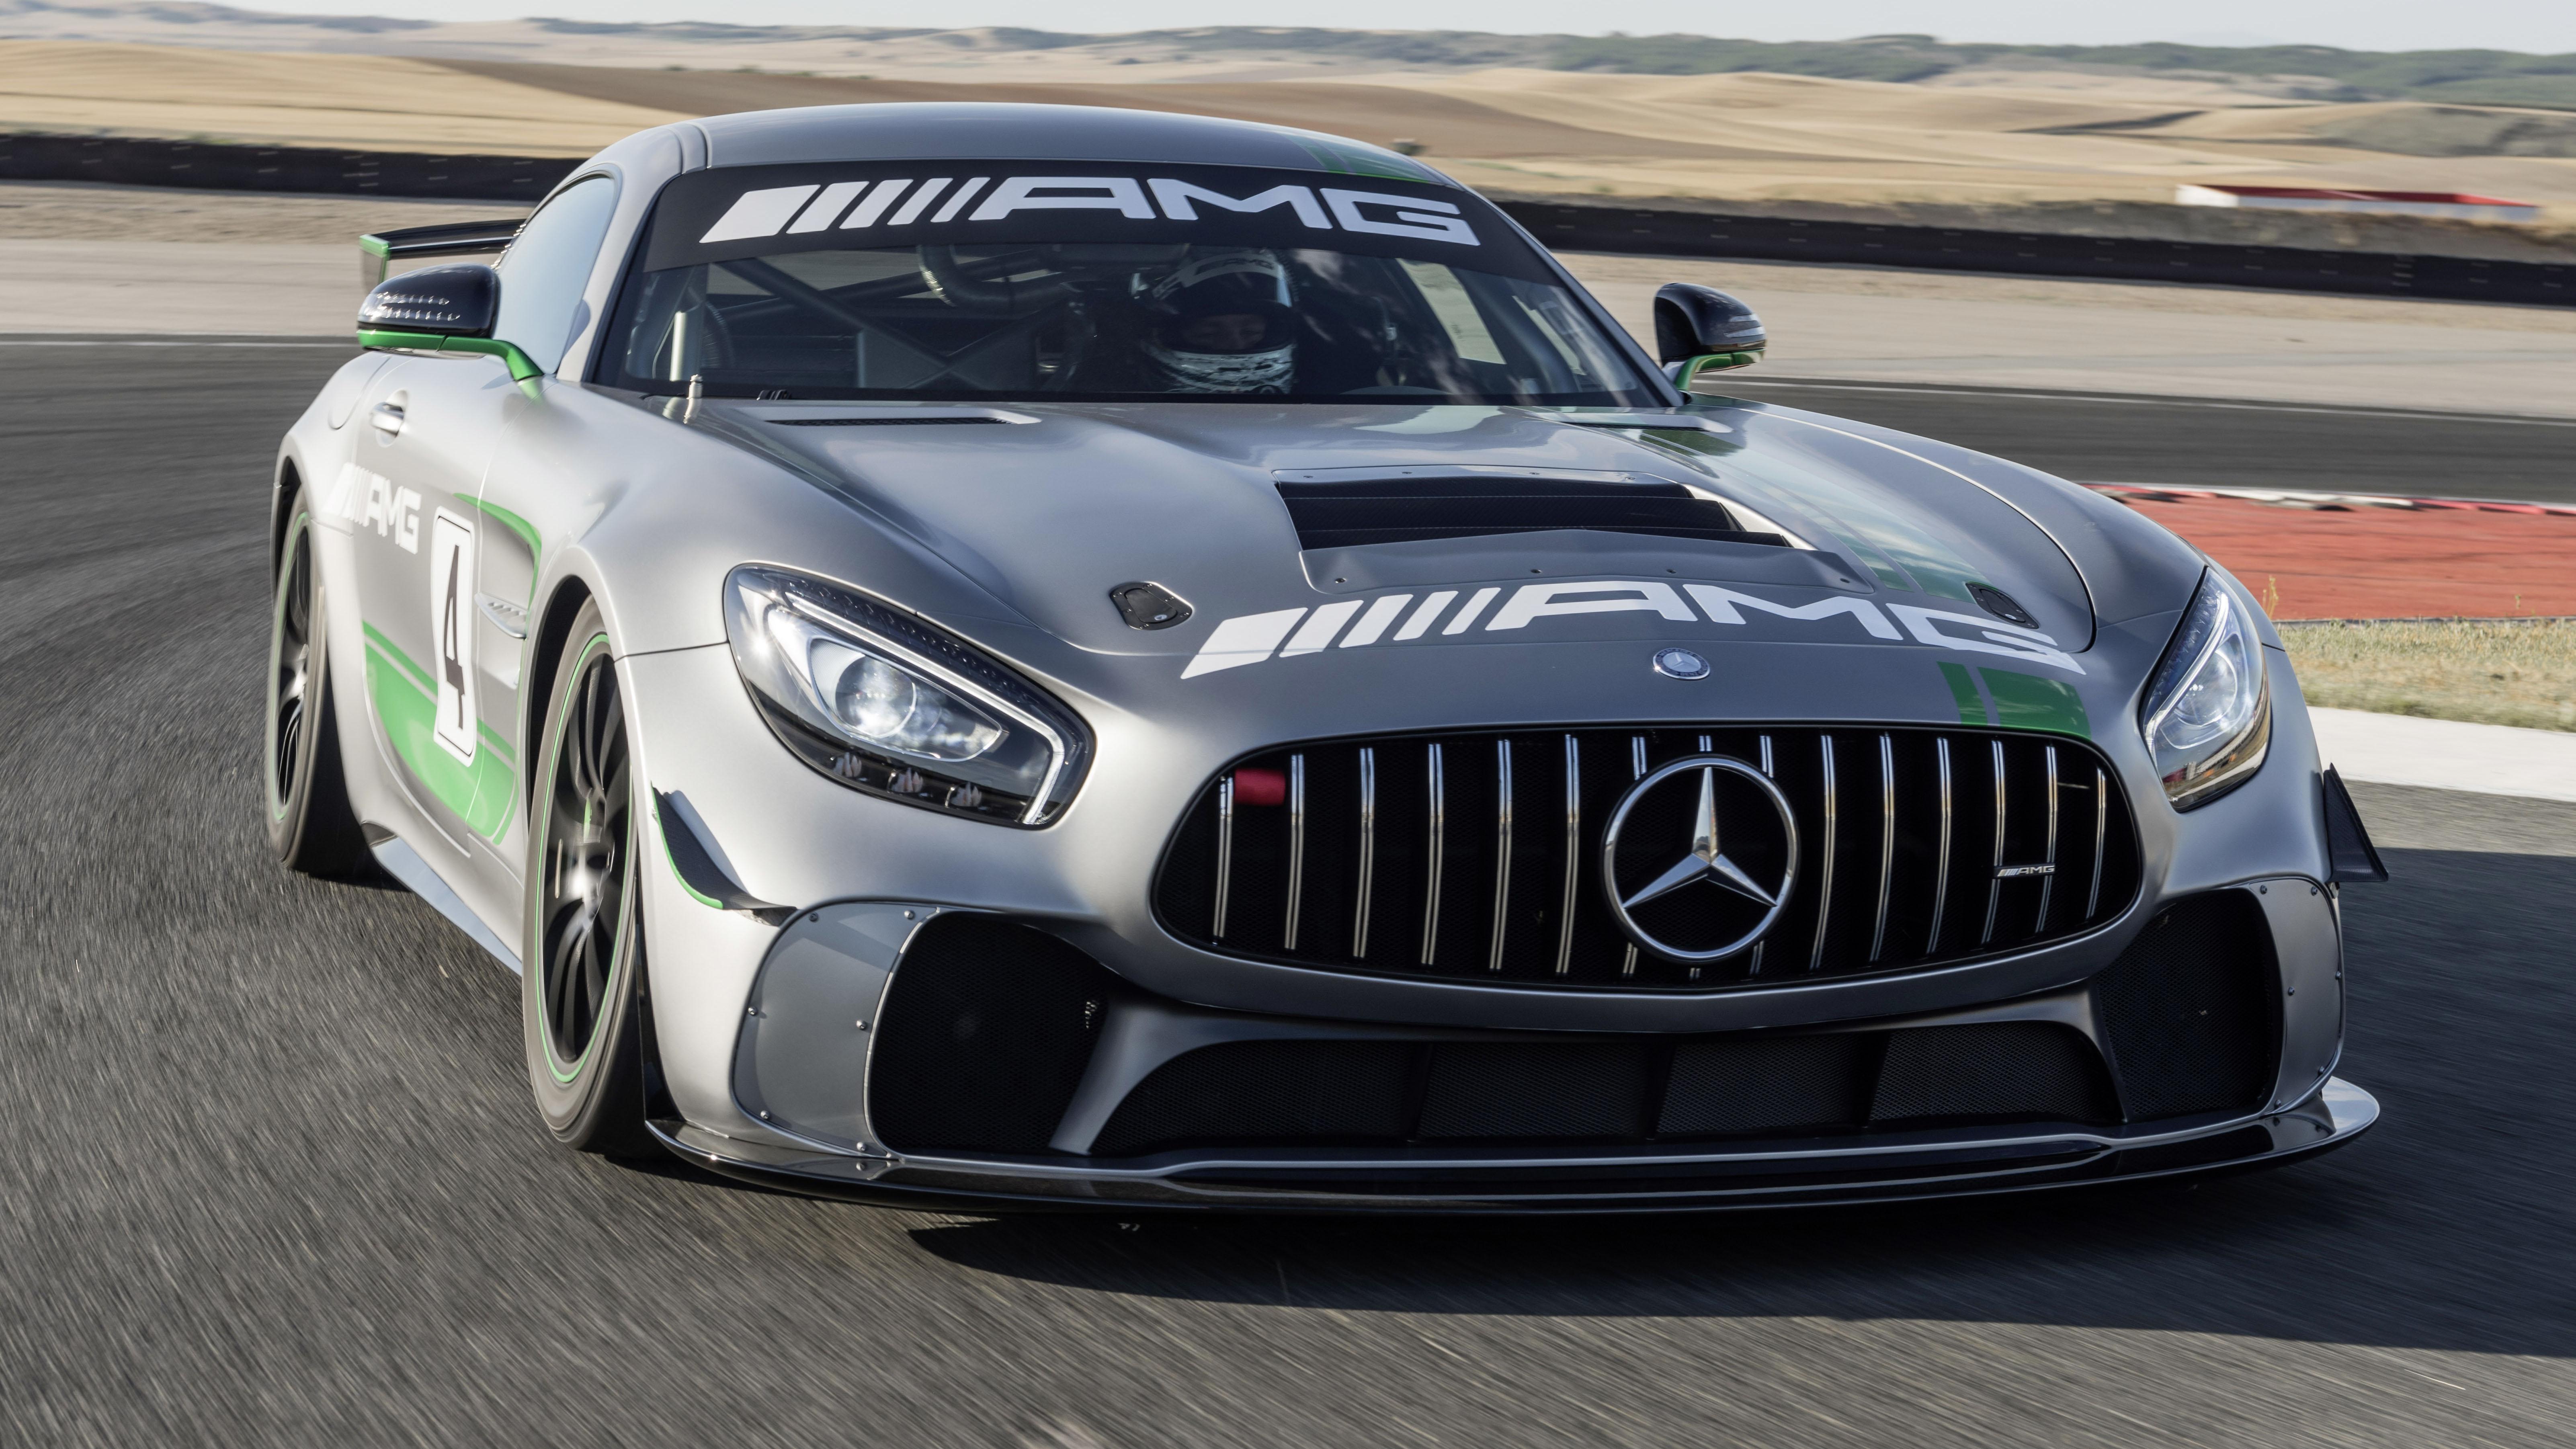 Mercedes-AMG GT4 front